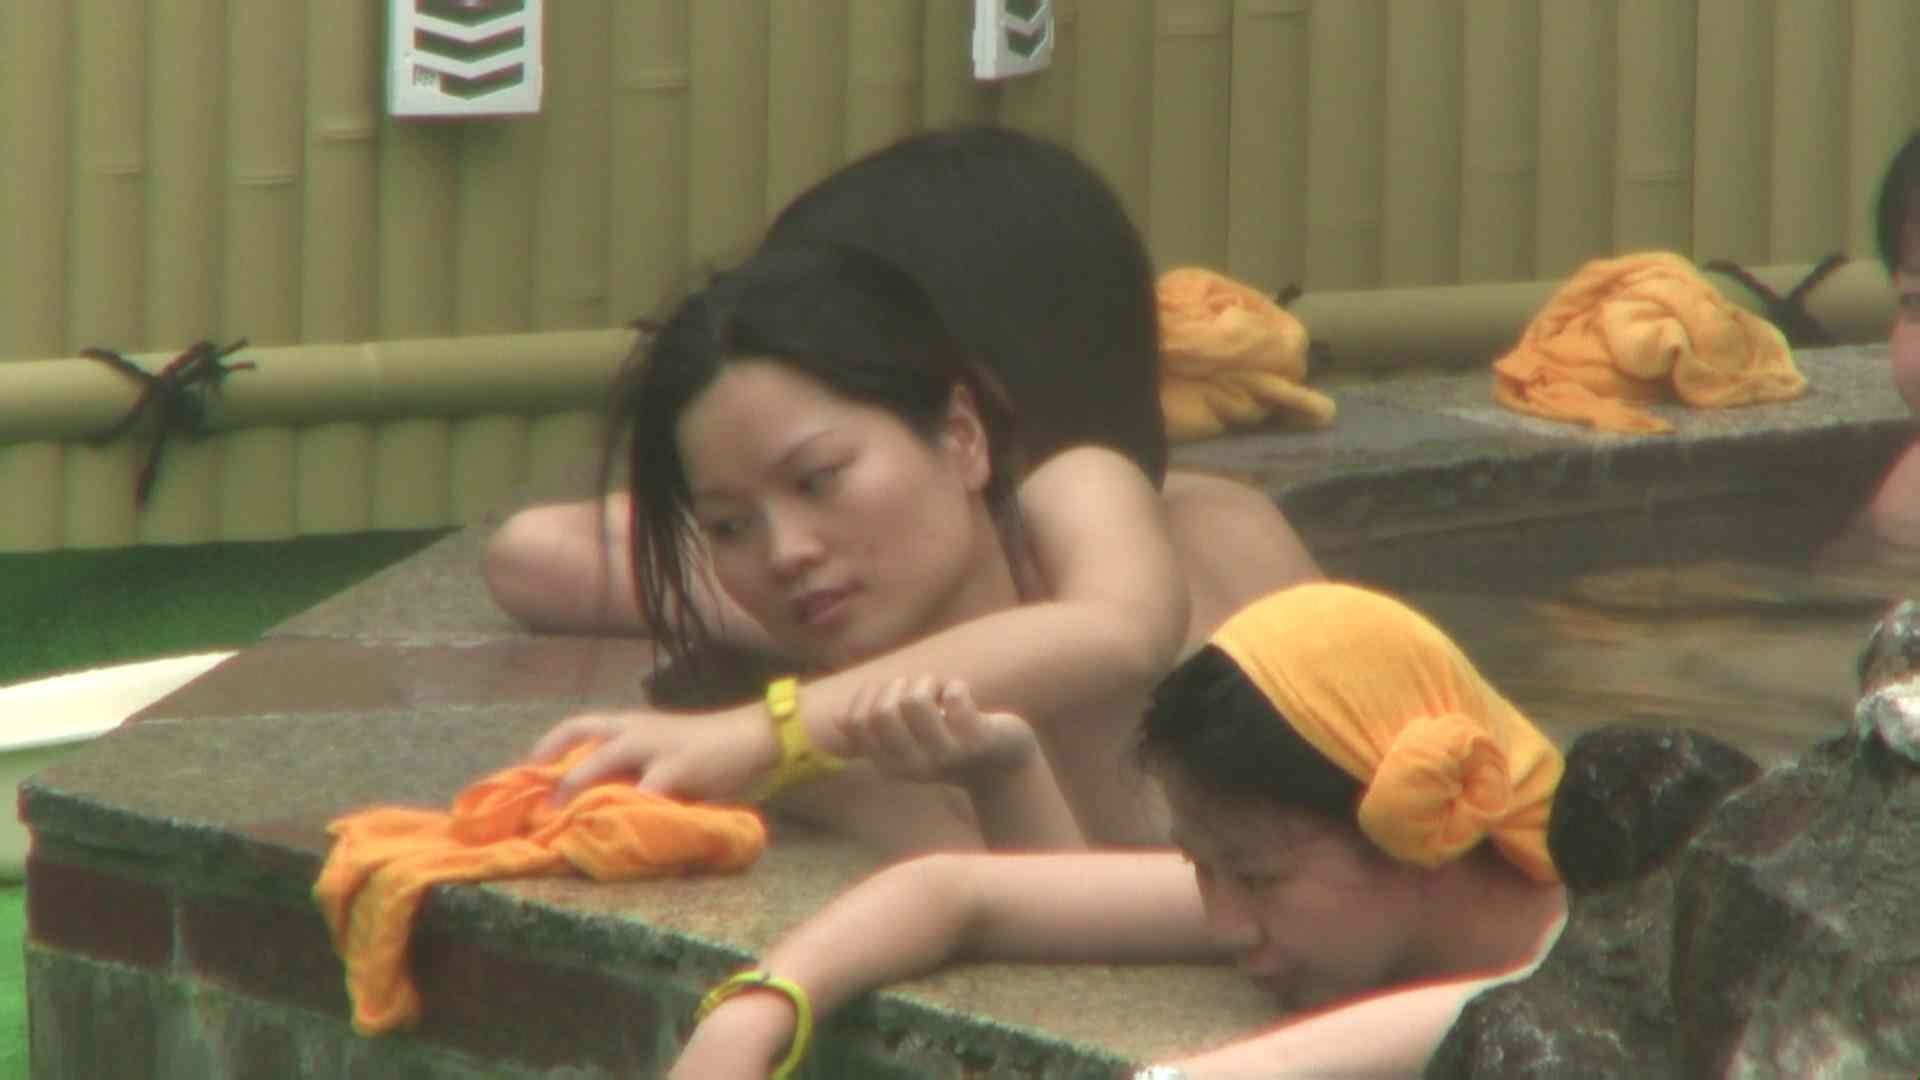 Aquaな露天風呂Vol.73【VIP限定】 盗撮 | HなOL  54pic 21